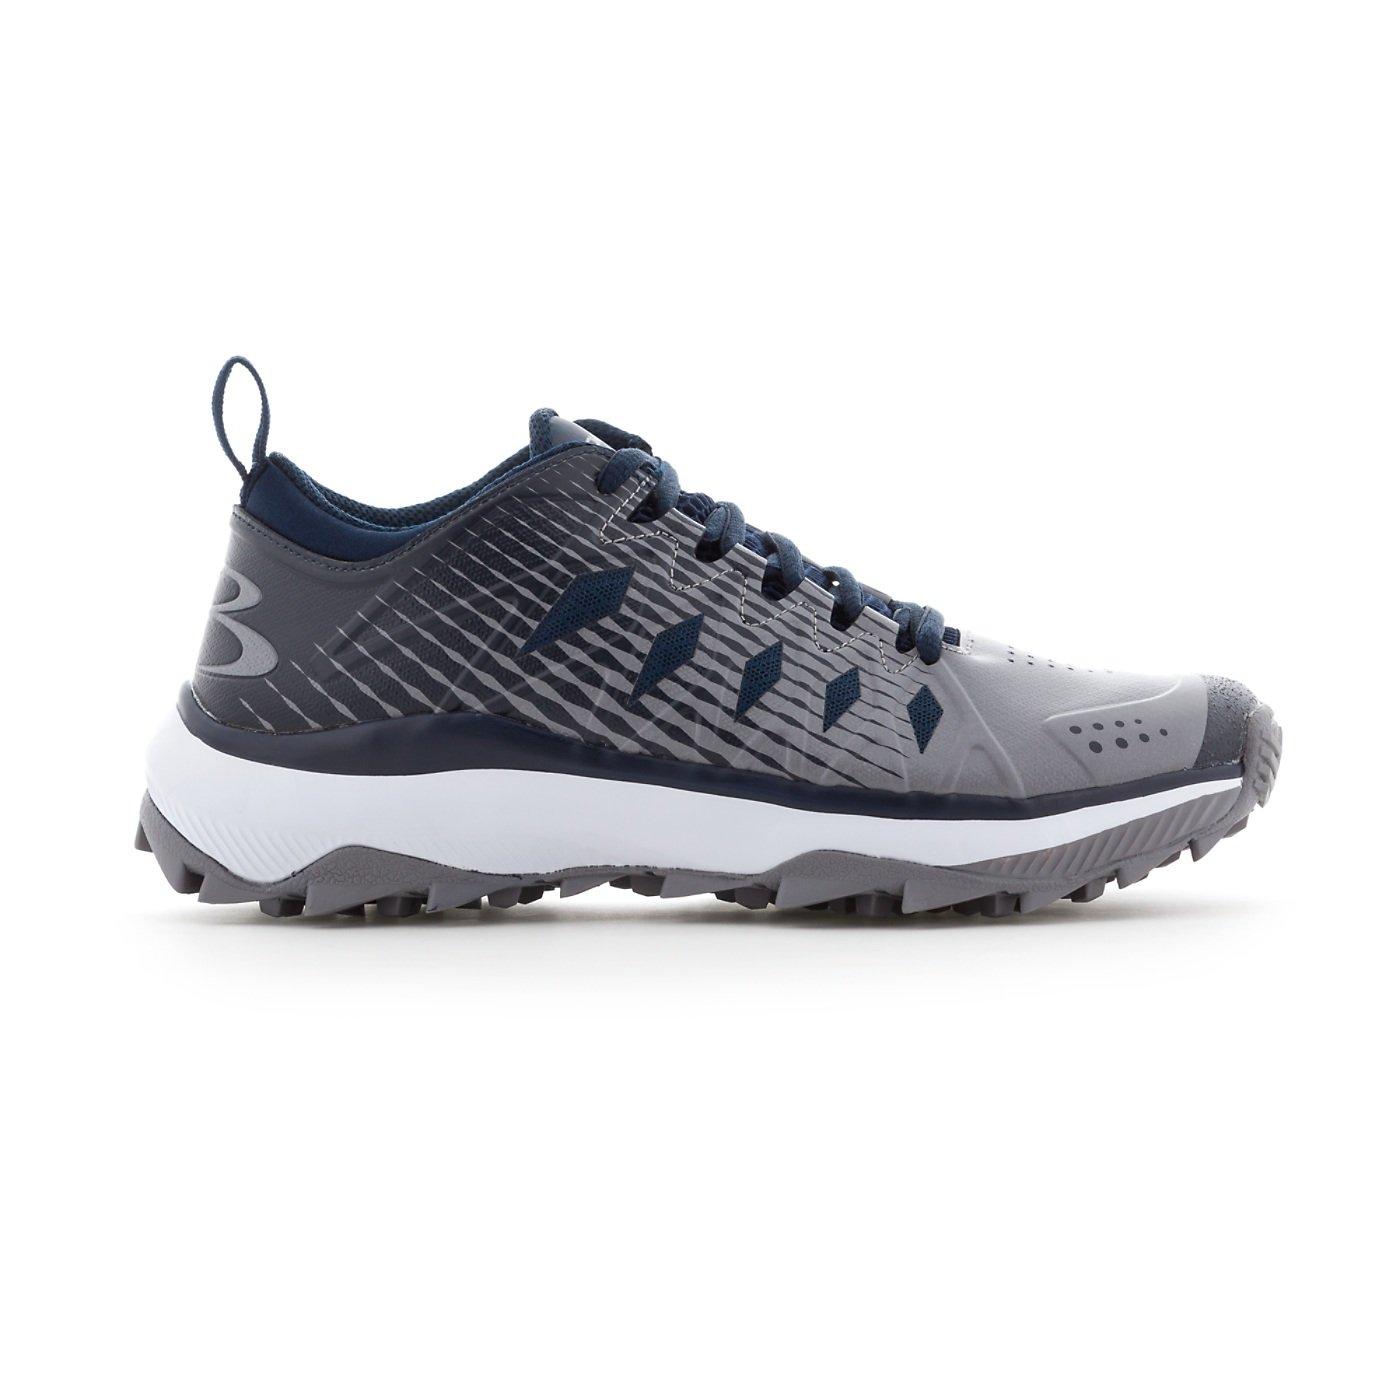 Boombah Women's Squadron Turf Shoes - 14 Color Options - Multiple Sizes B079K29KZN 9.5|Navy/Gray